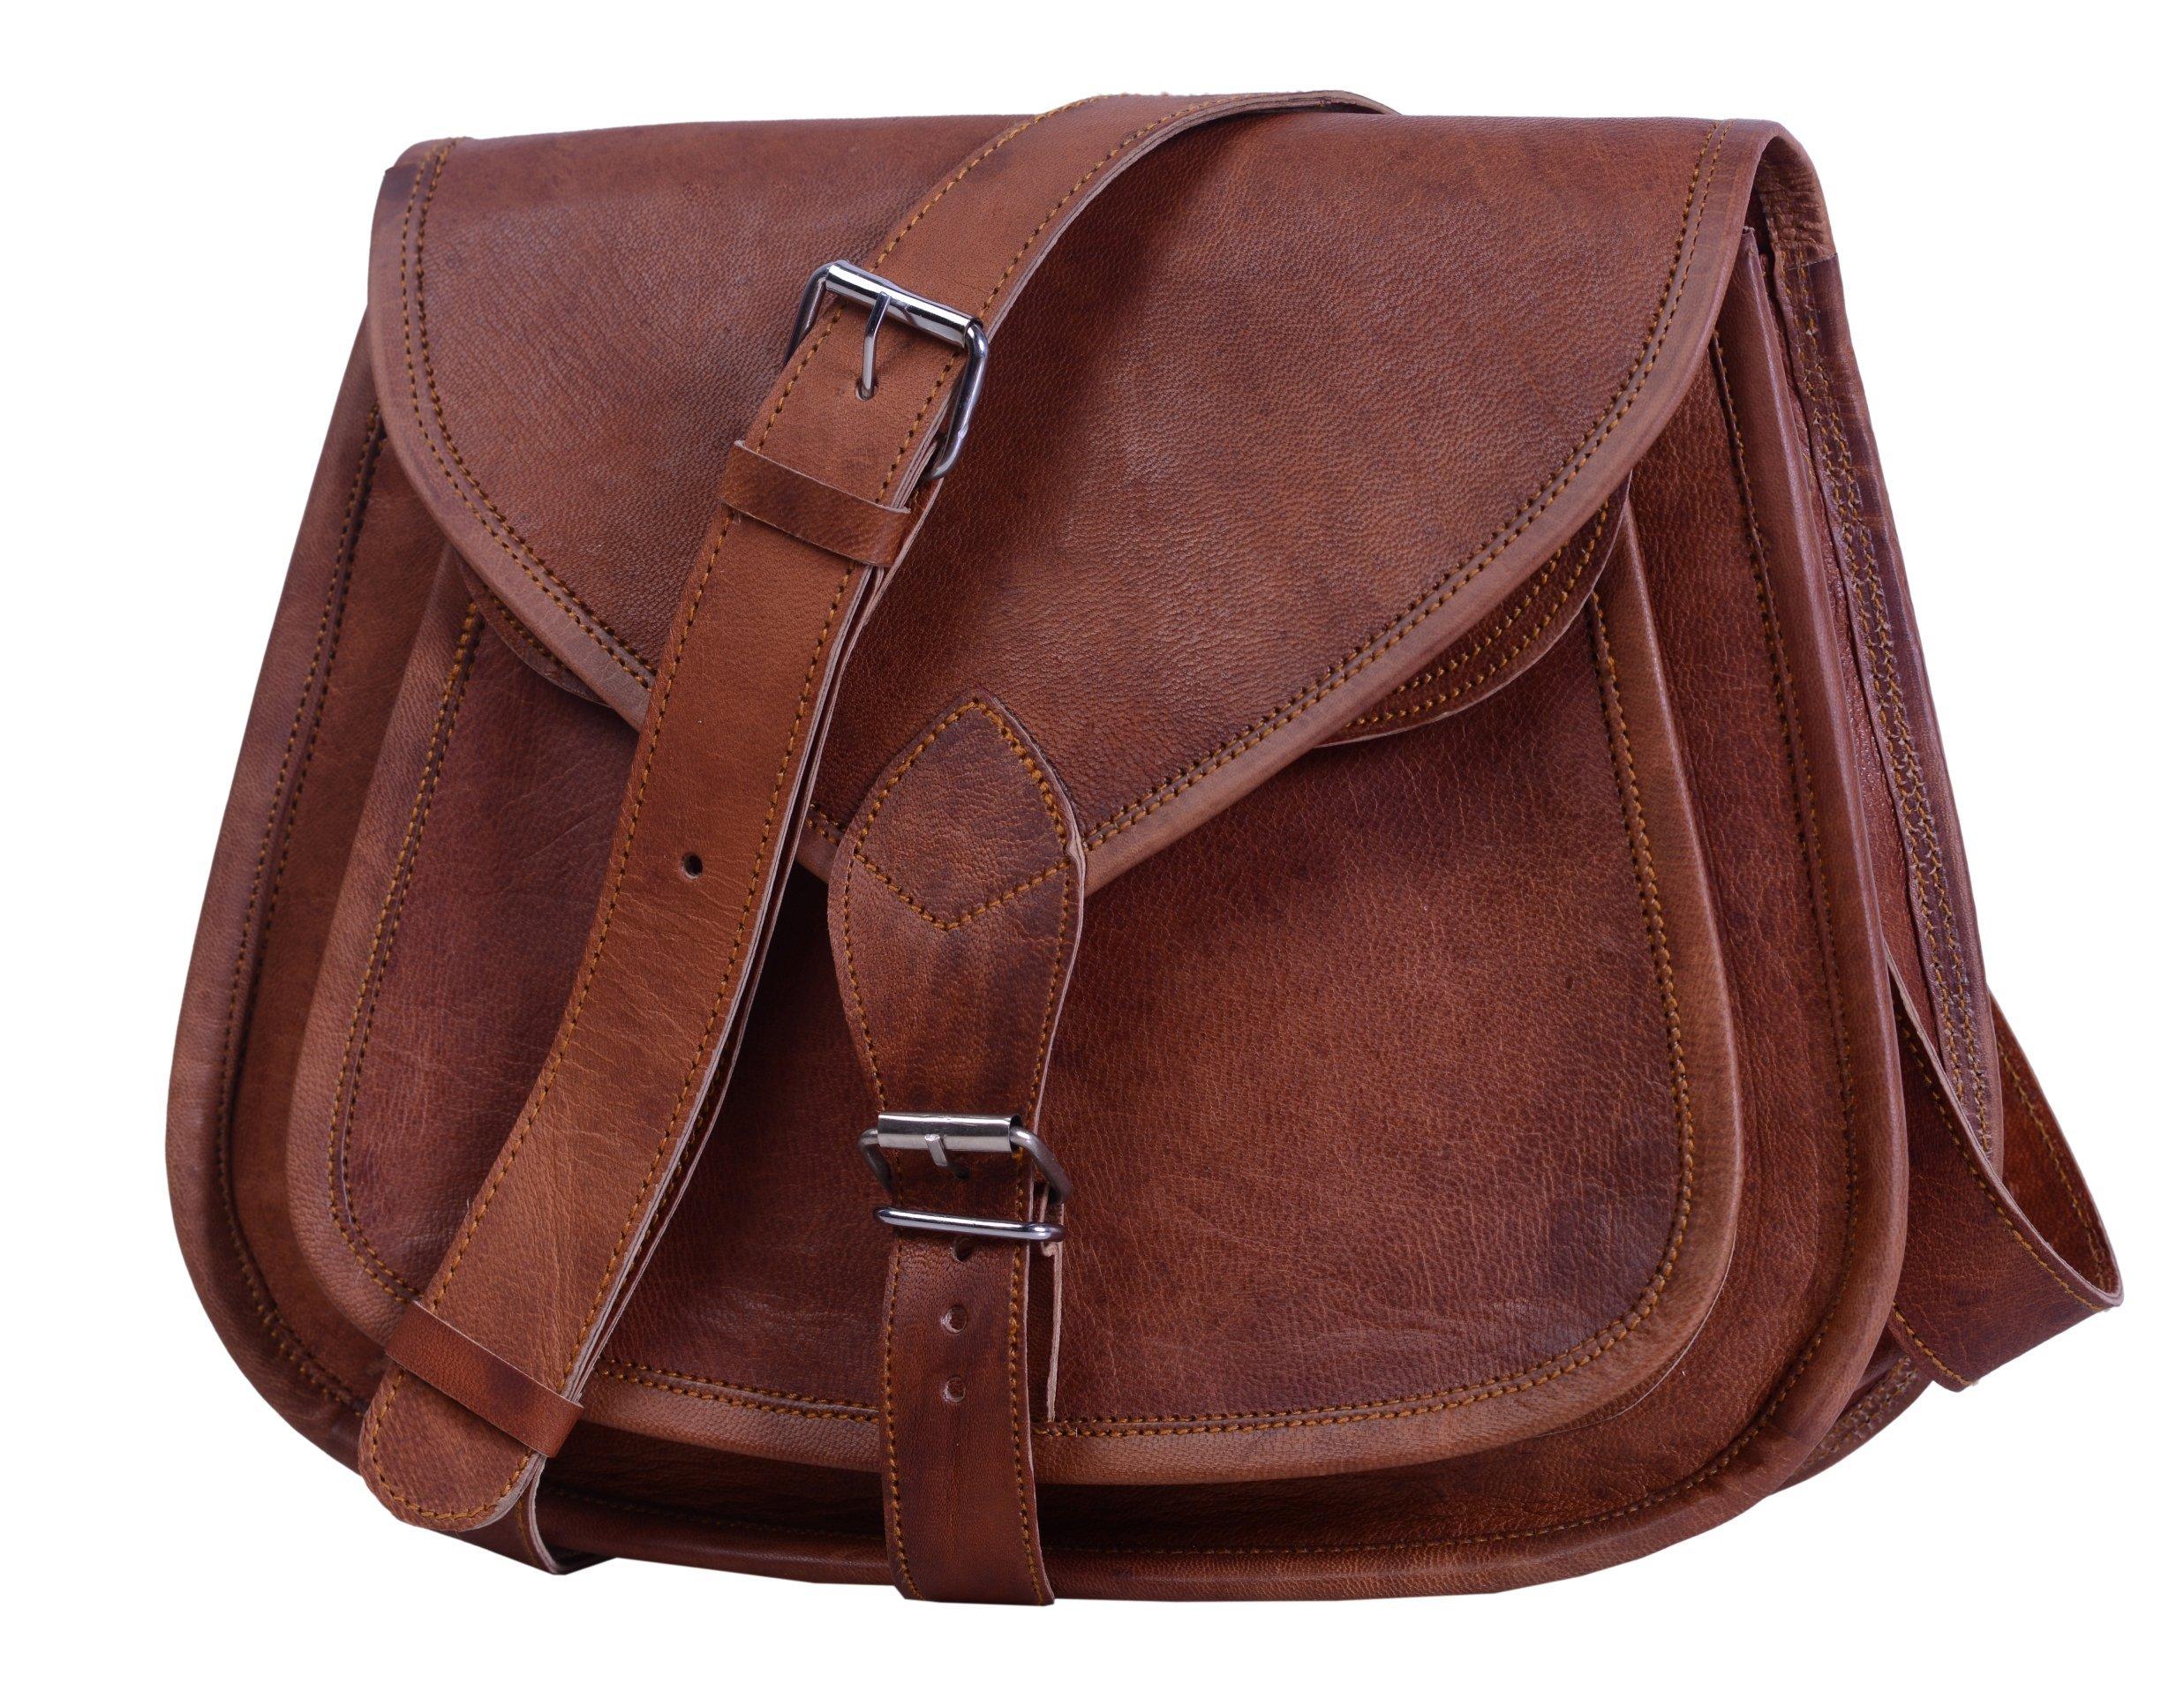 Komal's Passion Leather 12'' Leather Purse Satchel